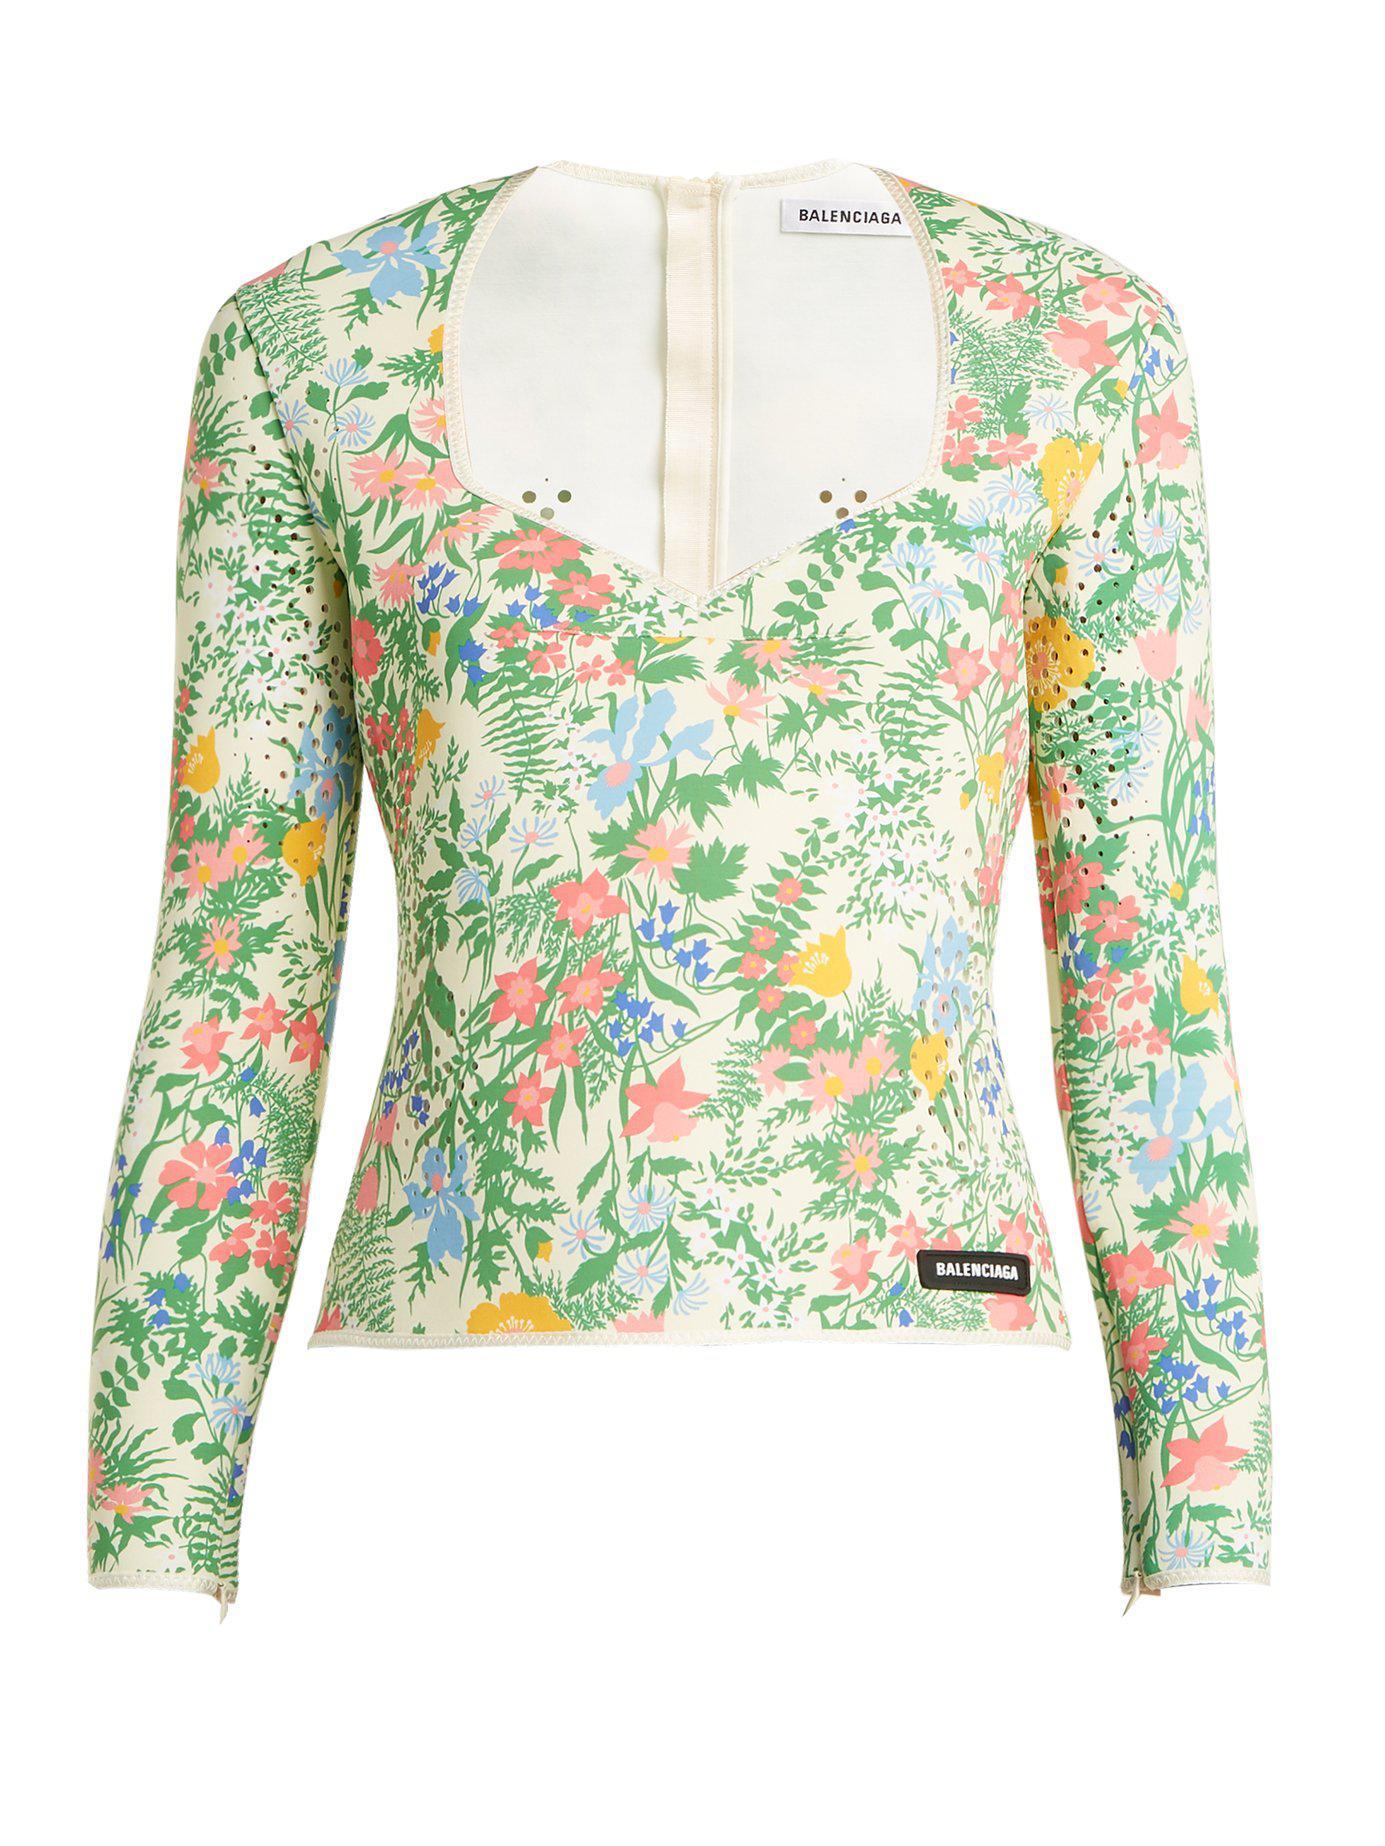 15a6091132af5 Balenciaga - Multicolor Floral Print Neoprene Top - Lyst. View fullscreen